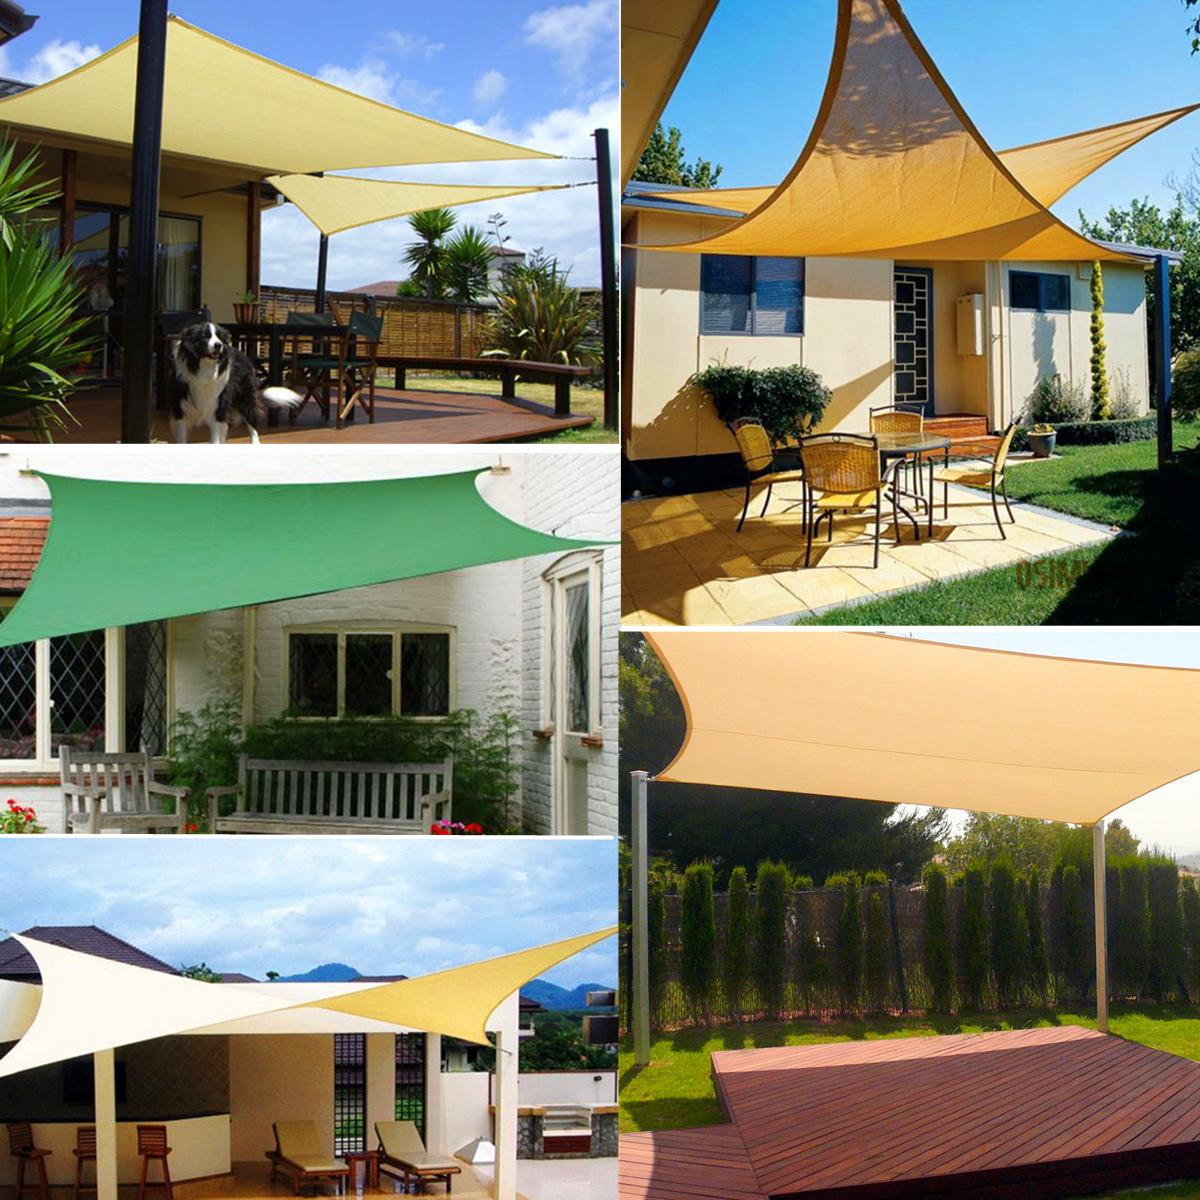 3.6x3.6x3.6m Sun Shade Sail Triangle Fabric Cover Cloth for Patio Canopy Garden